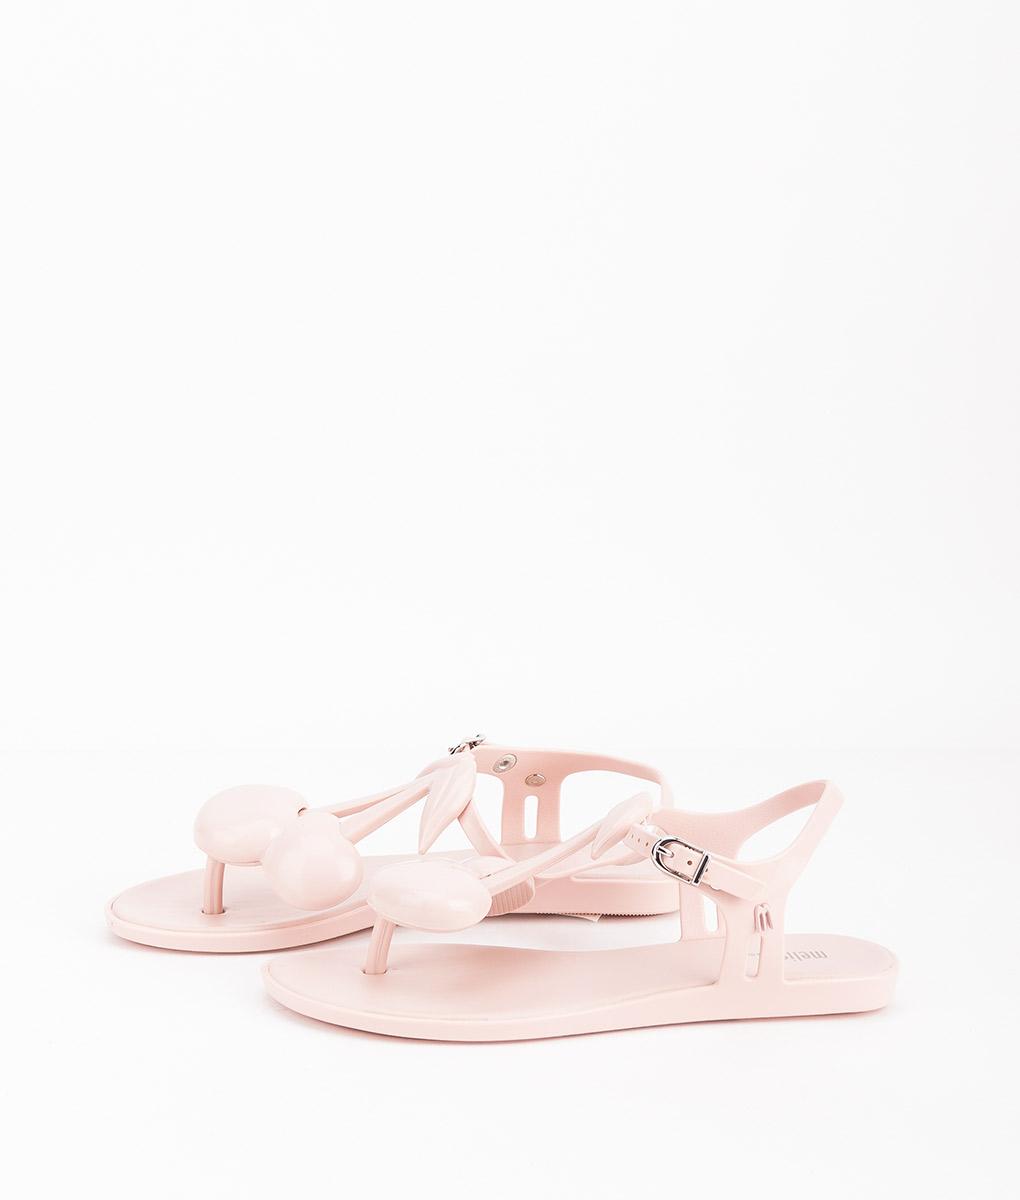 MELISSA Woman Sandals 32301 SOLAR IV, Pink 66.99